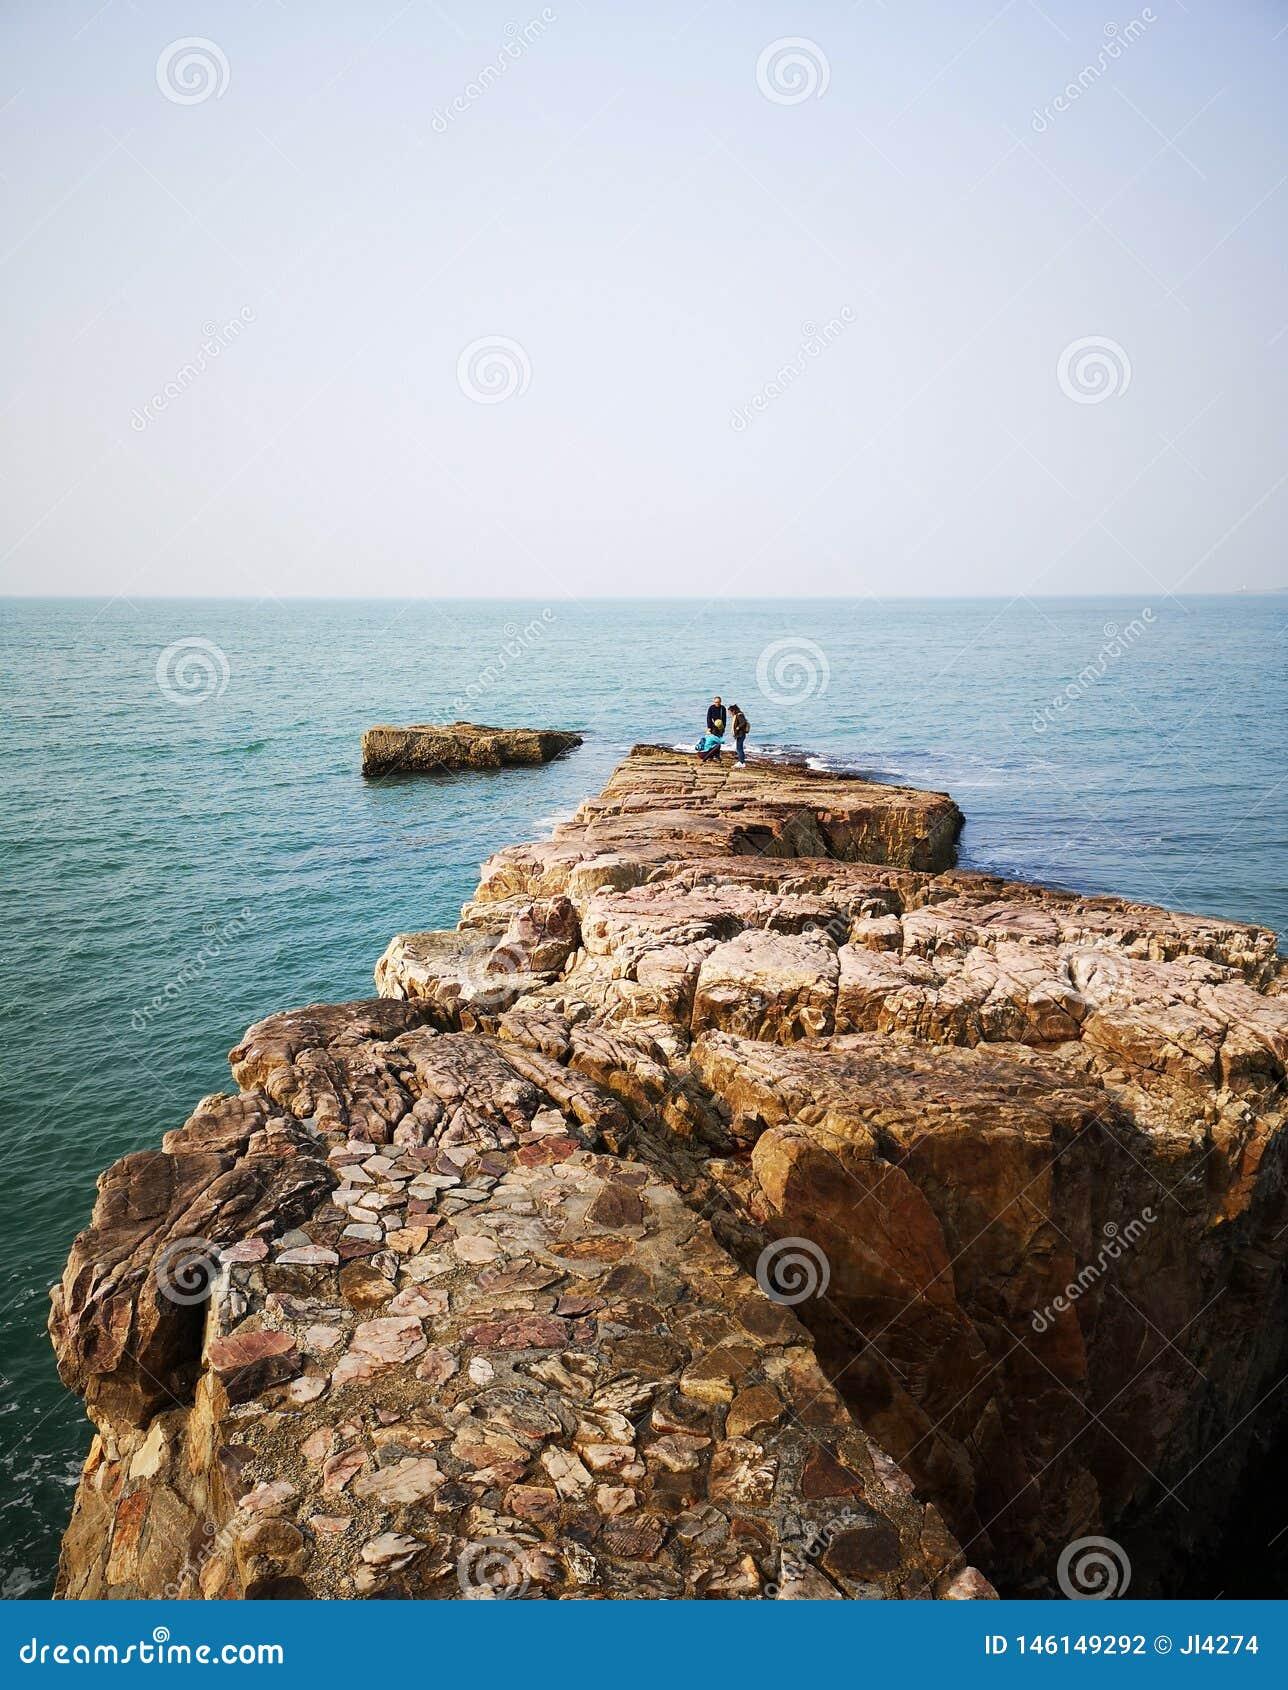 A great rock and the Bohai Sea